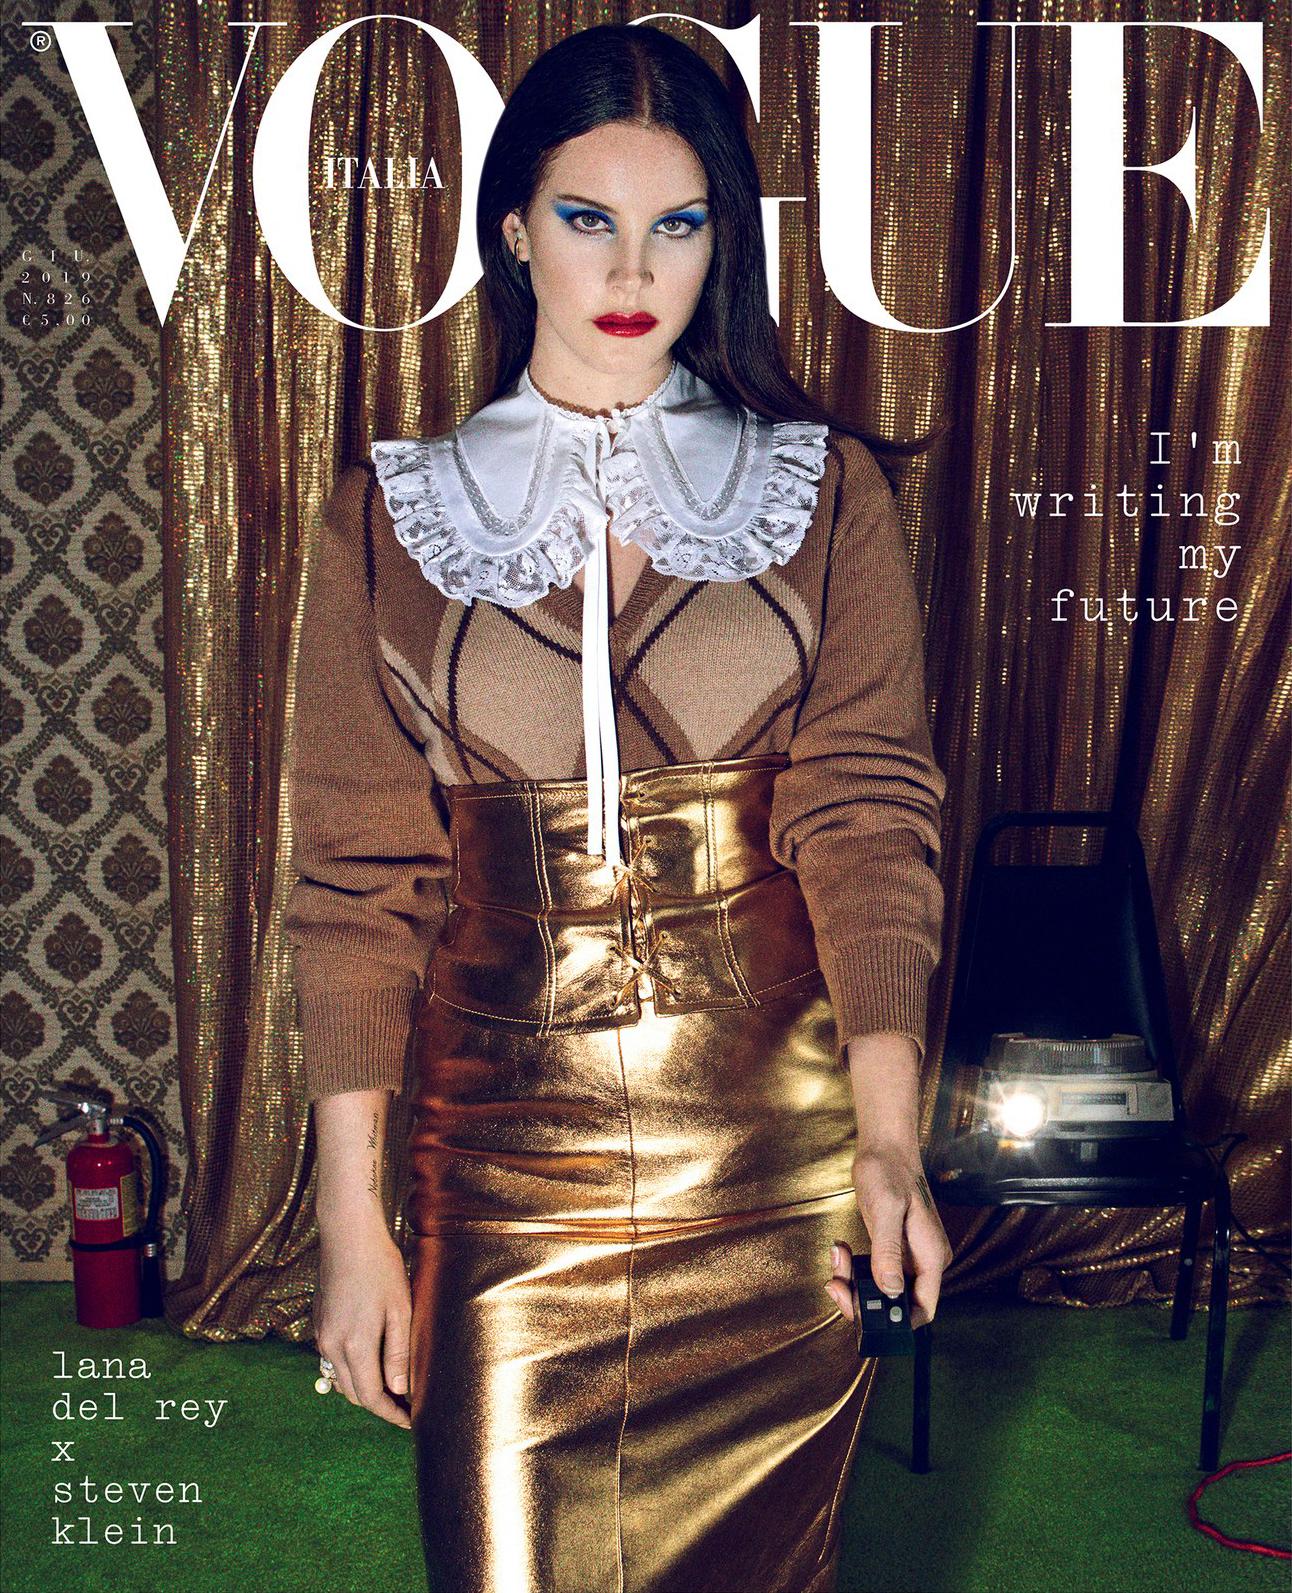 Lana Del Ray by Steven Klein for Vogue Italia June 2019 Cover (14).jpg